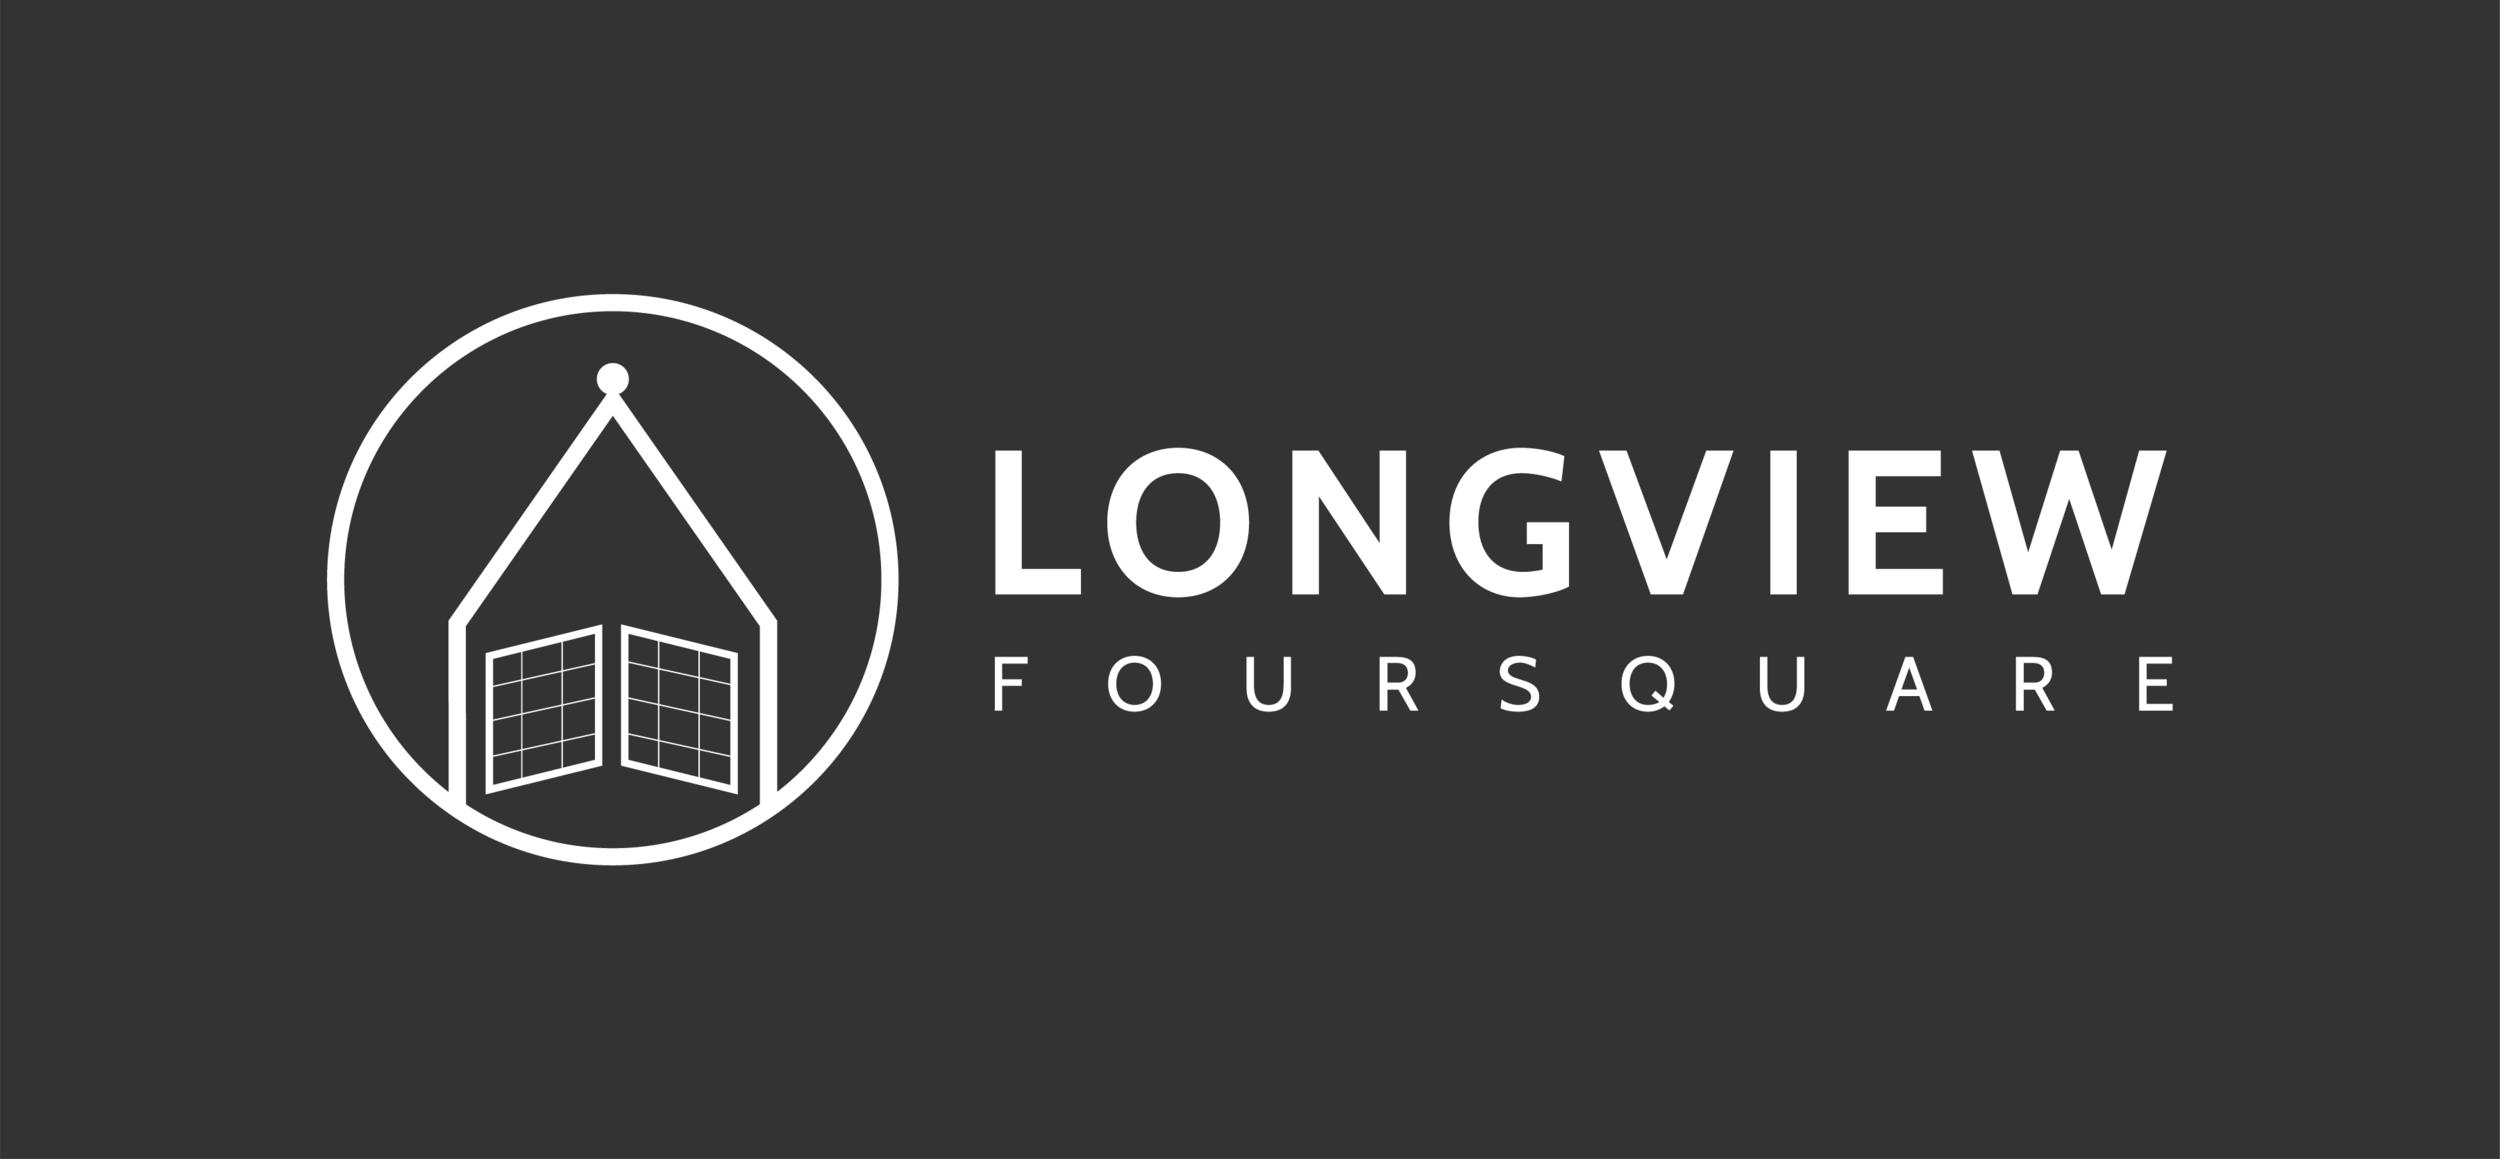 Longview Foursquare Logo Ideas V4-03.png